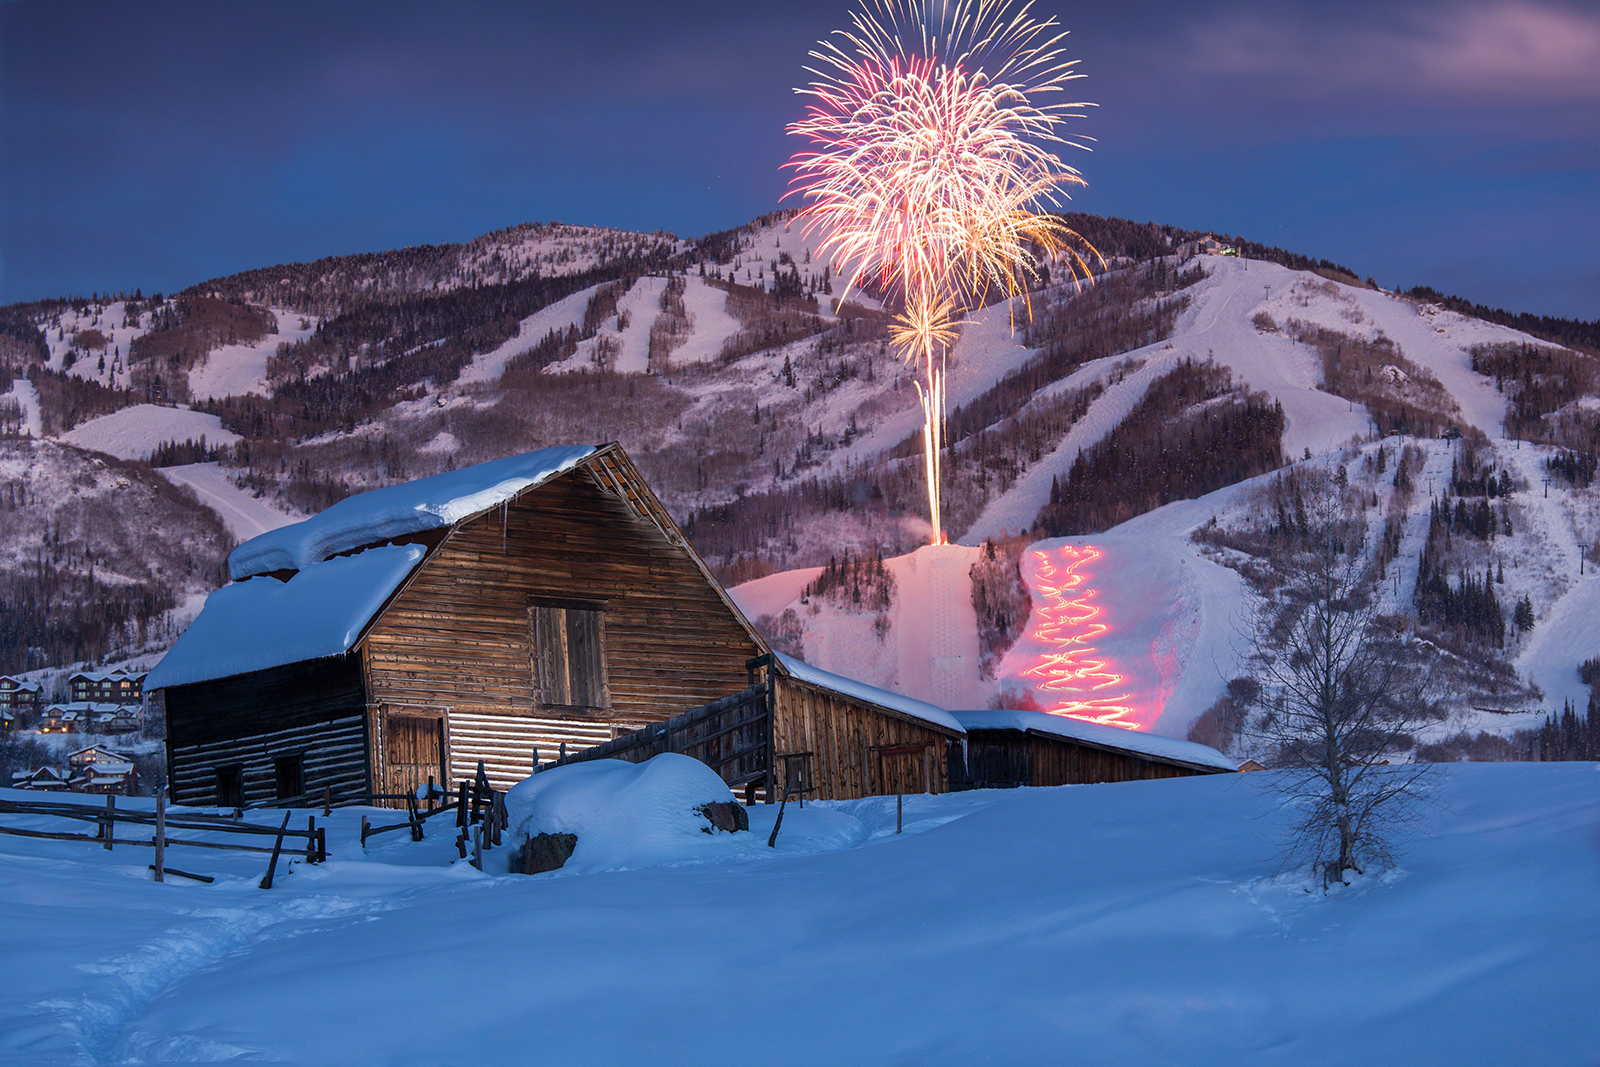 ck_barn fireworks-11 tlfw.jpg